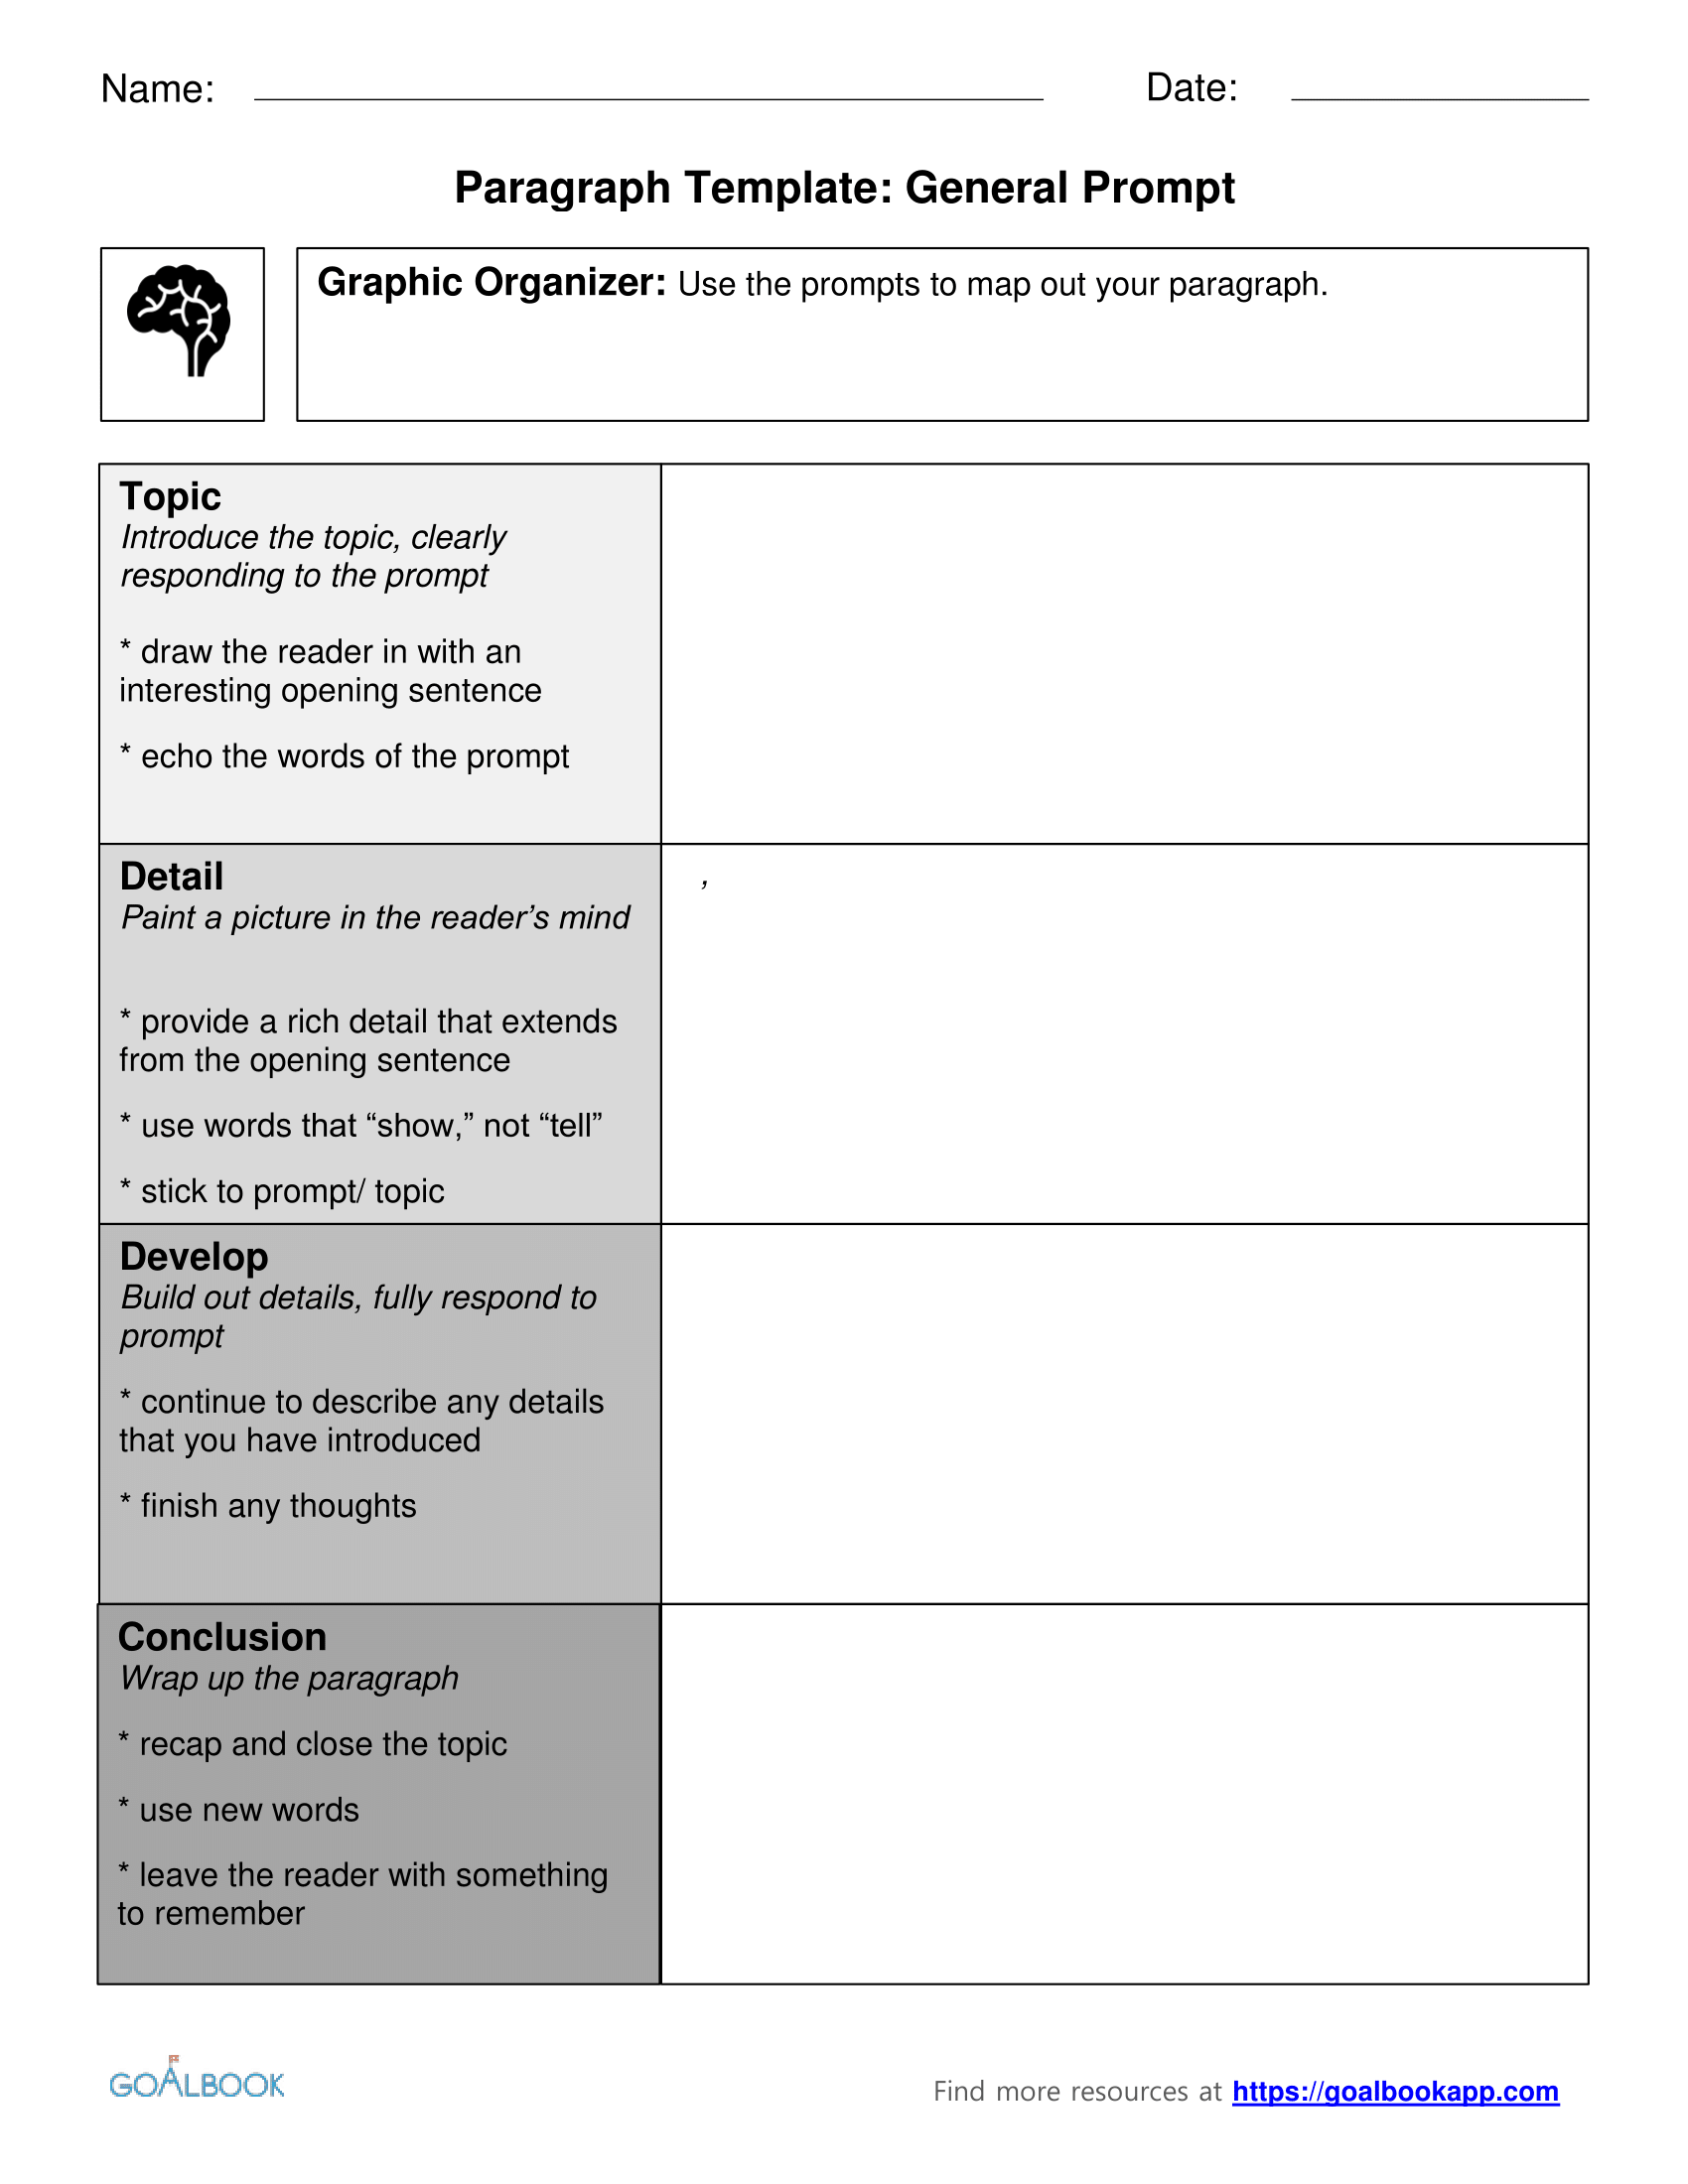 Paragraph Template Udl Strategies Goalbook Toolkit